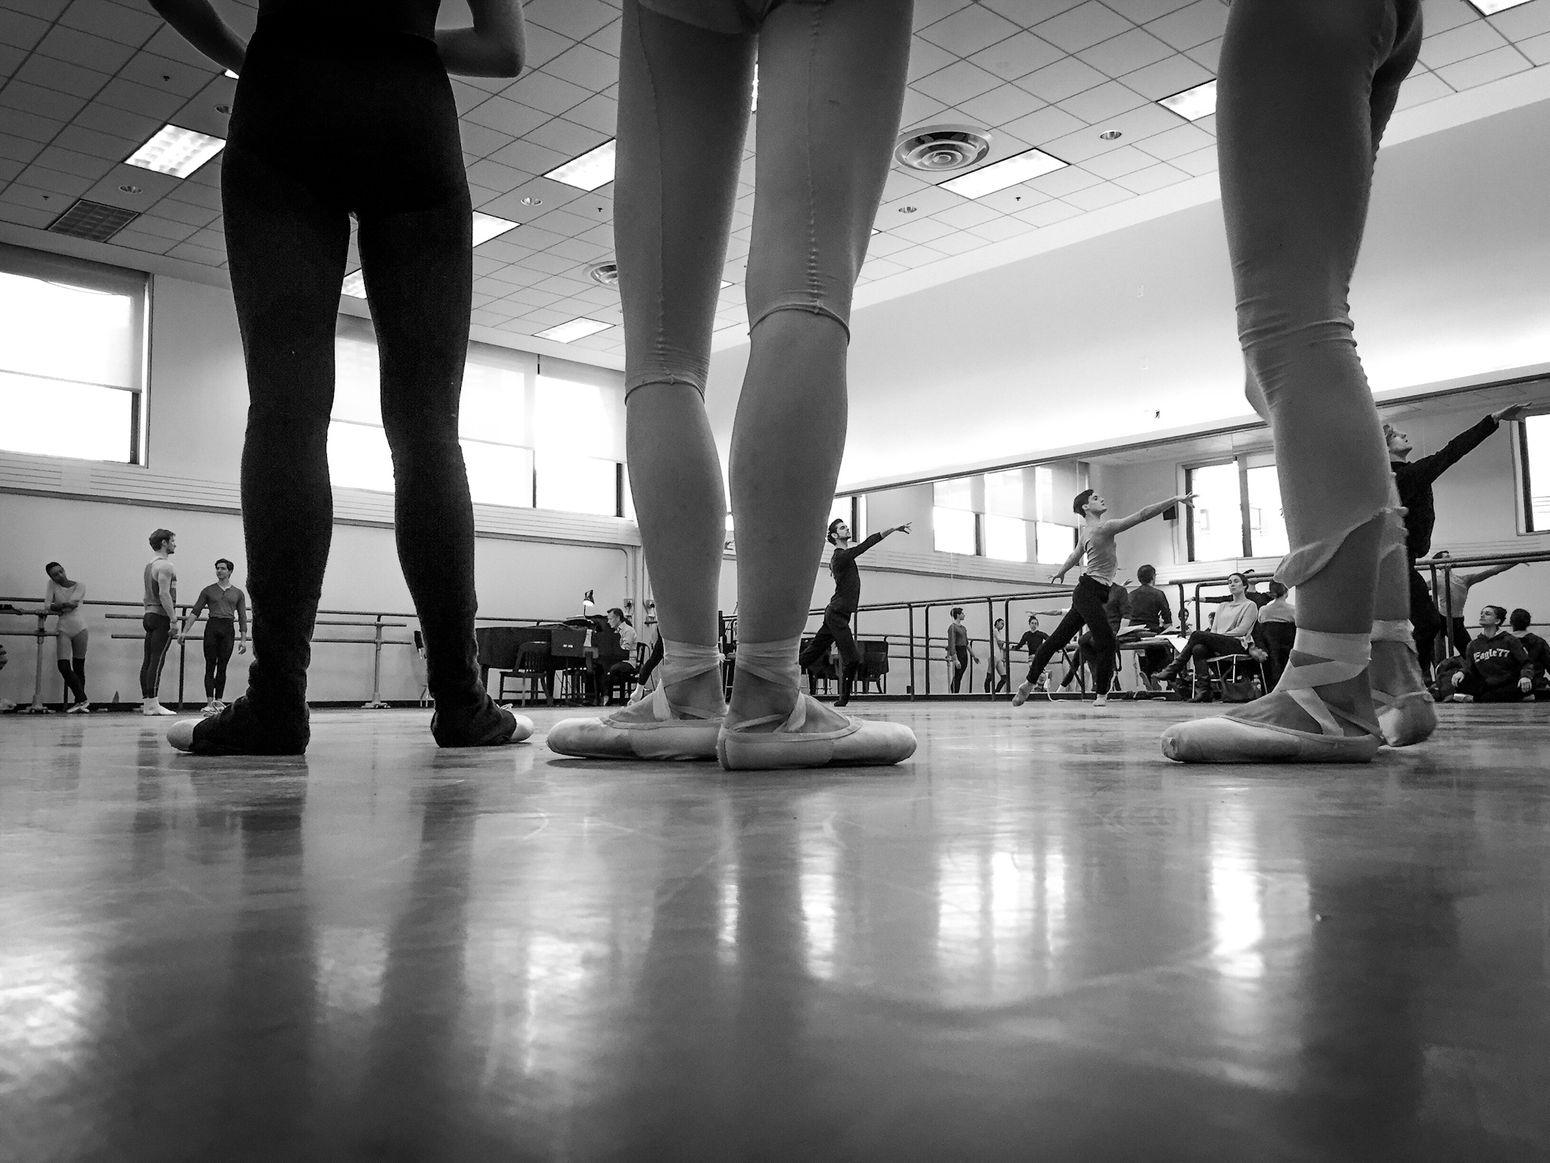 Legs NewYorkCityBallet Ballerina Rehearsing Blackandwhite Photography Monochrome Legs Dance